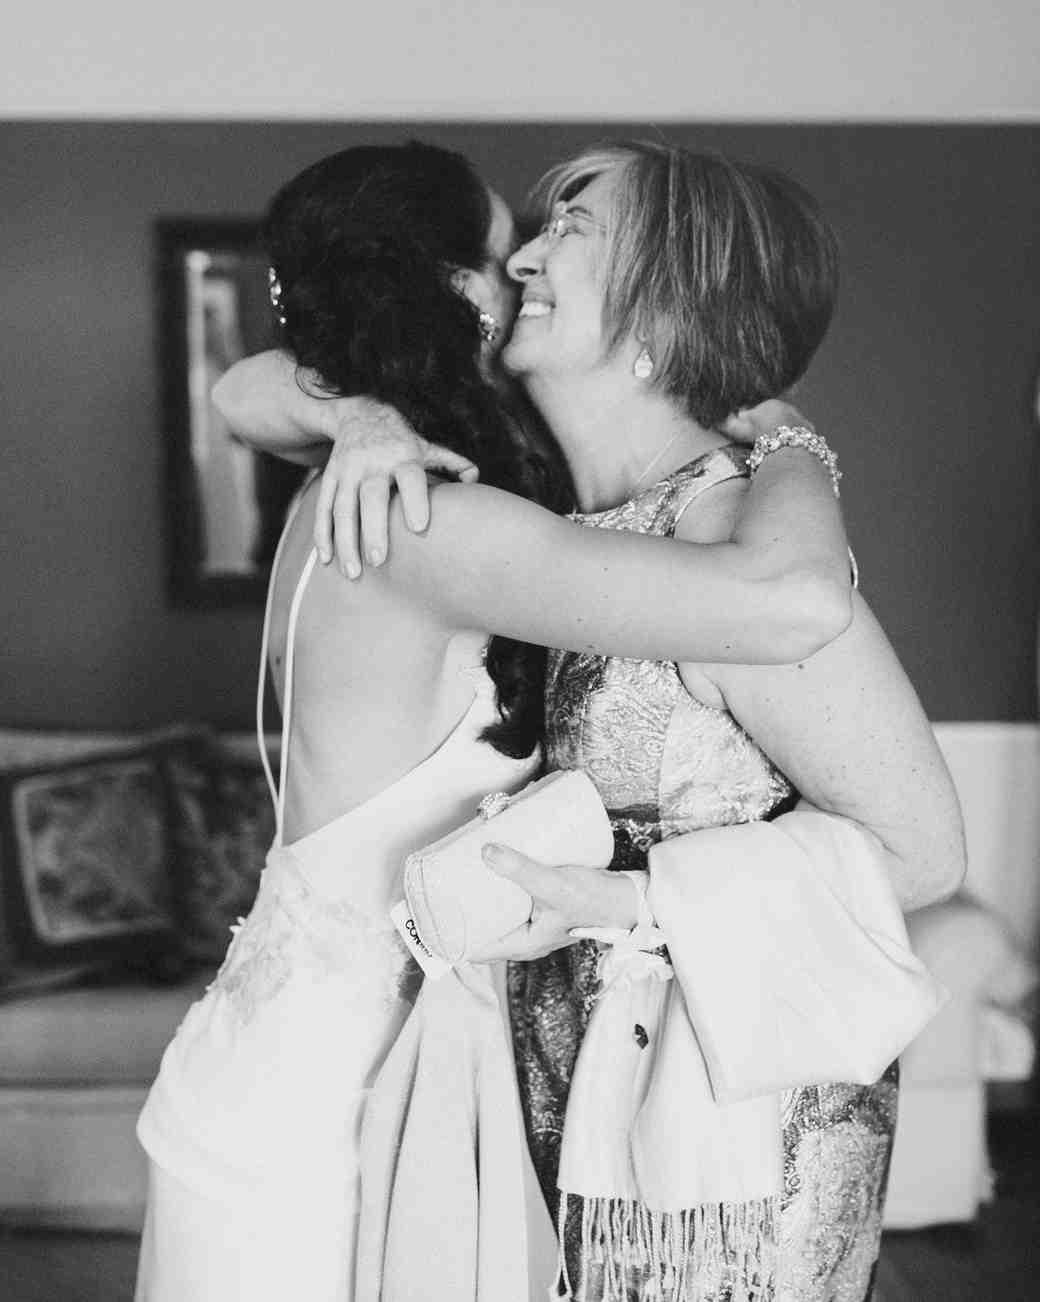 rosie-constantine-wedding-hug-031-s112177-1015.jpg